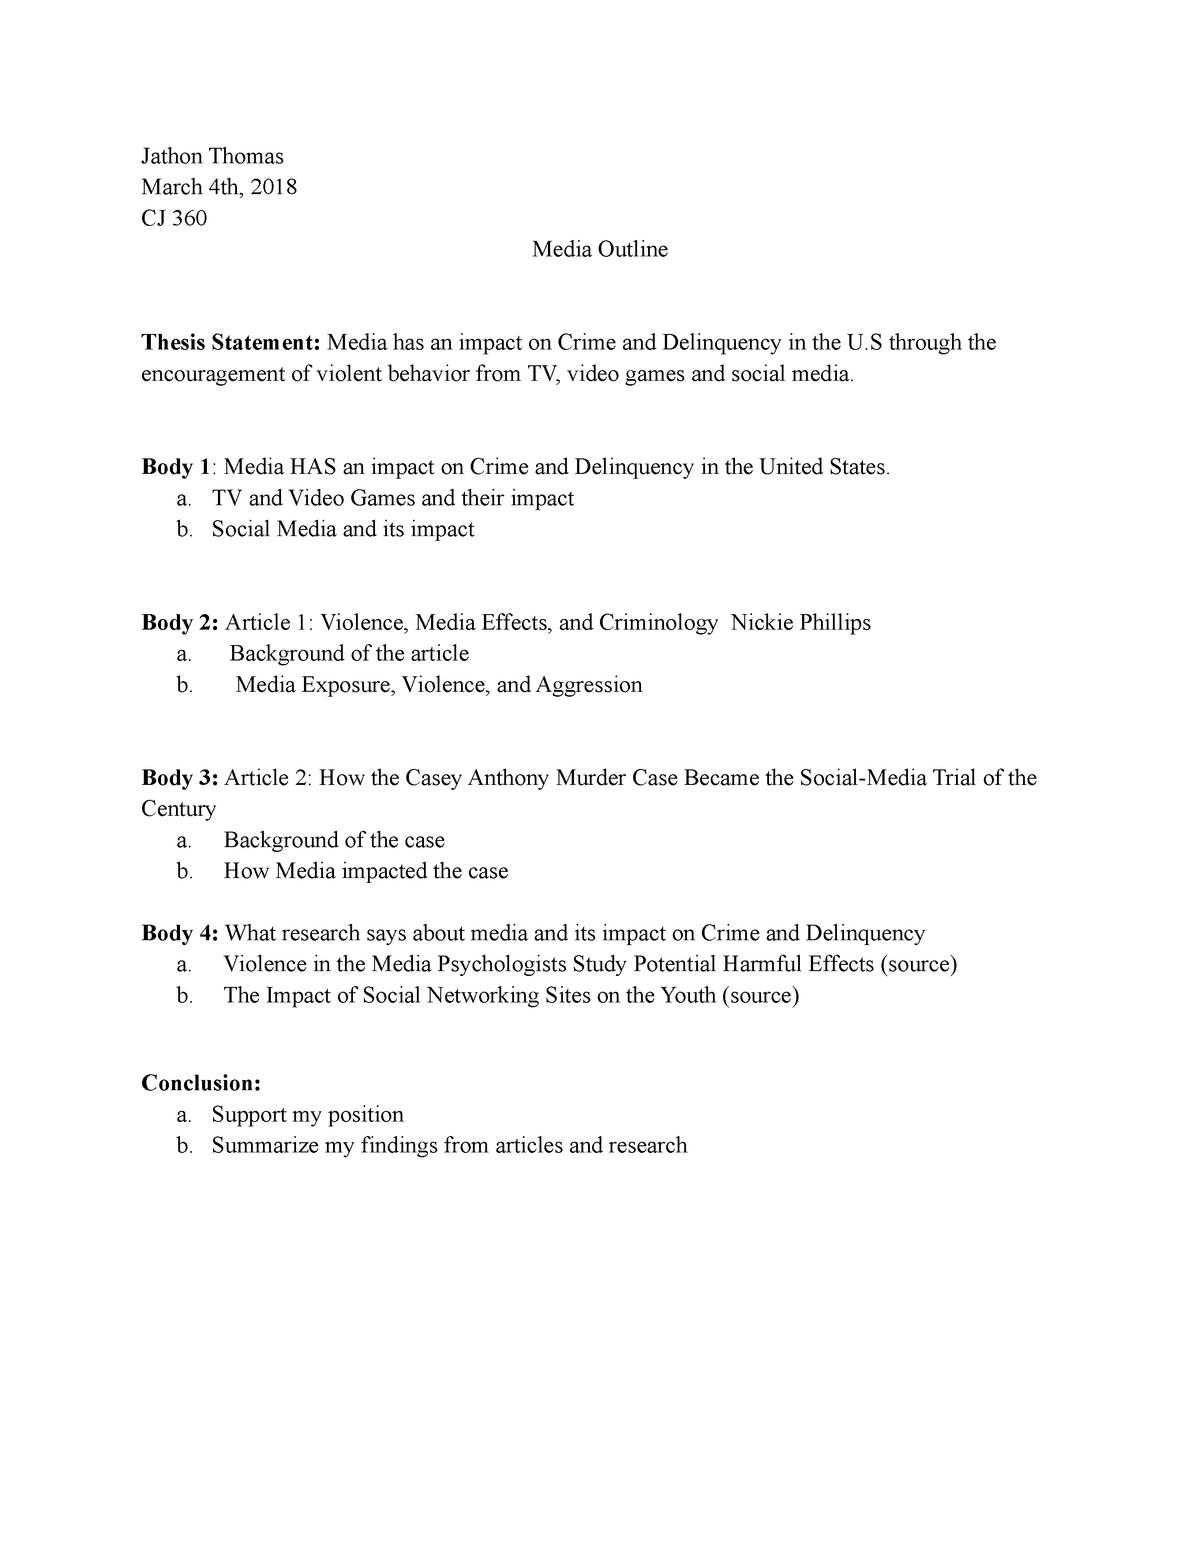 Costco marketing strategy term paper